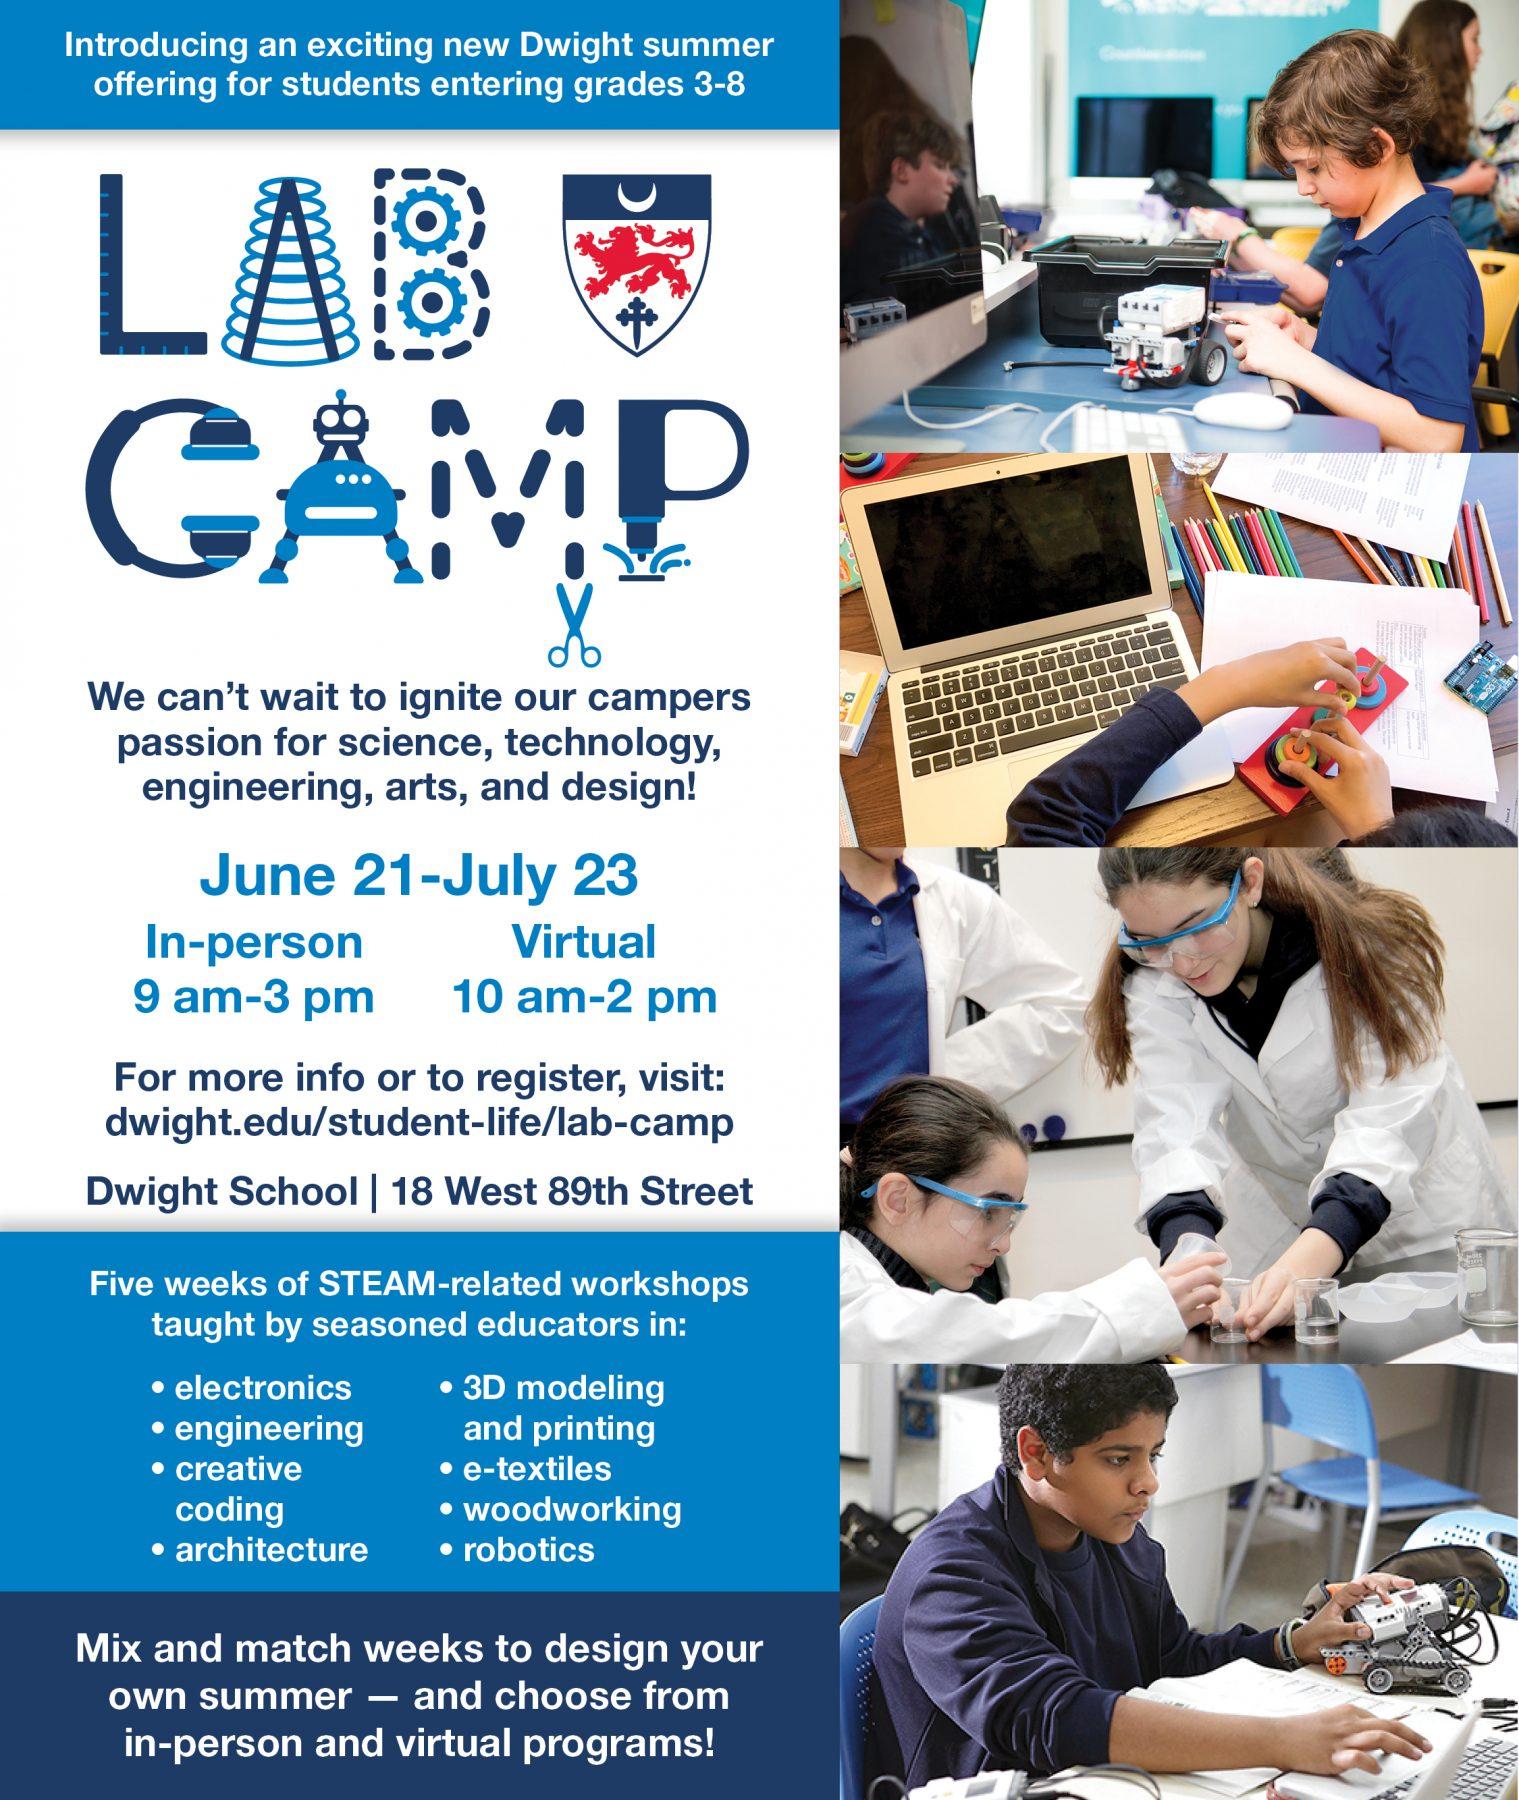 Dwight School Summer Camp Lab Camp